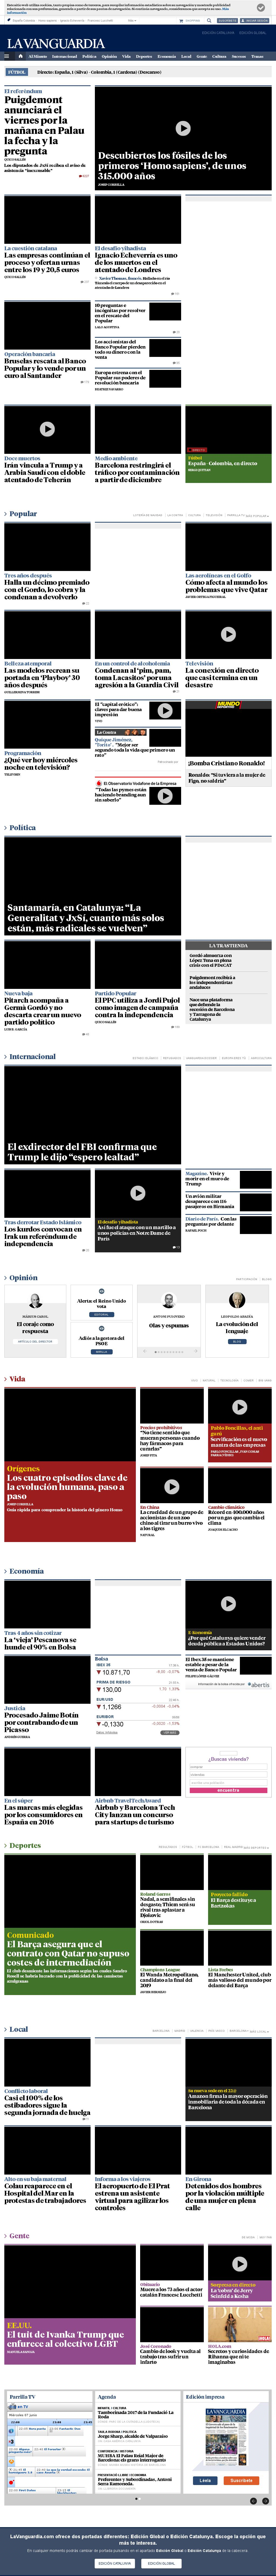 La Vanguardia at Wednesday June 7, 2017, 8:47 p.m. UTC